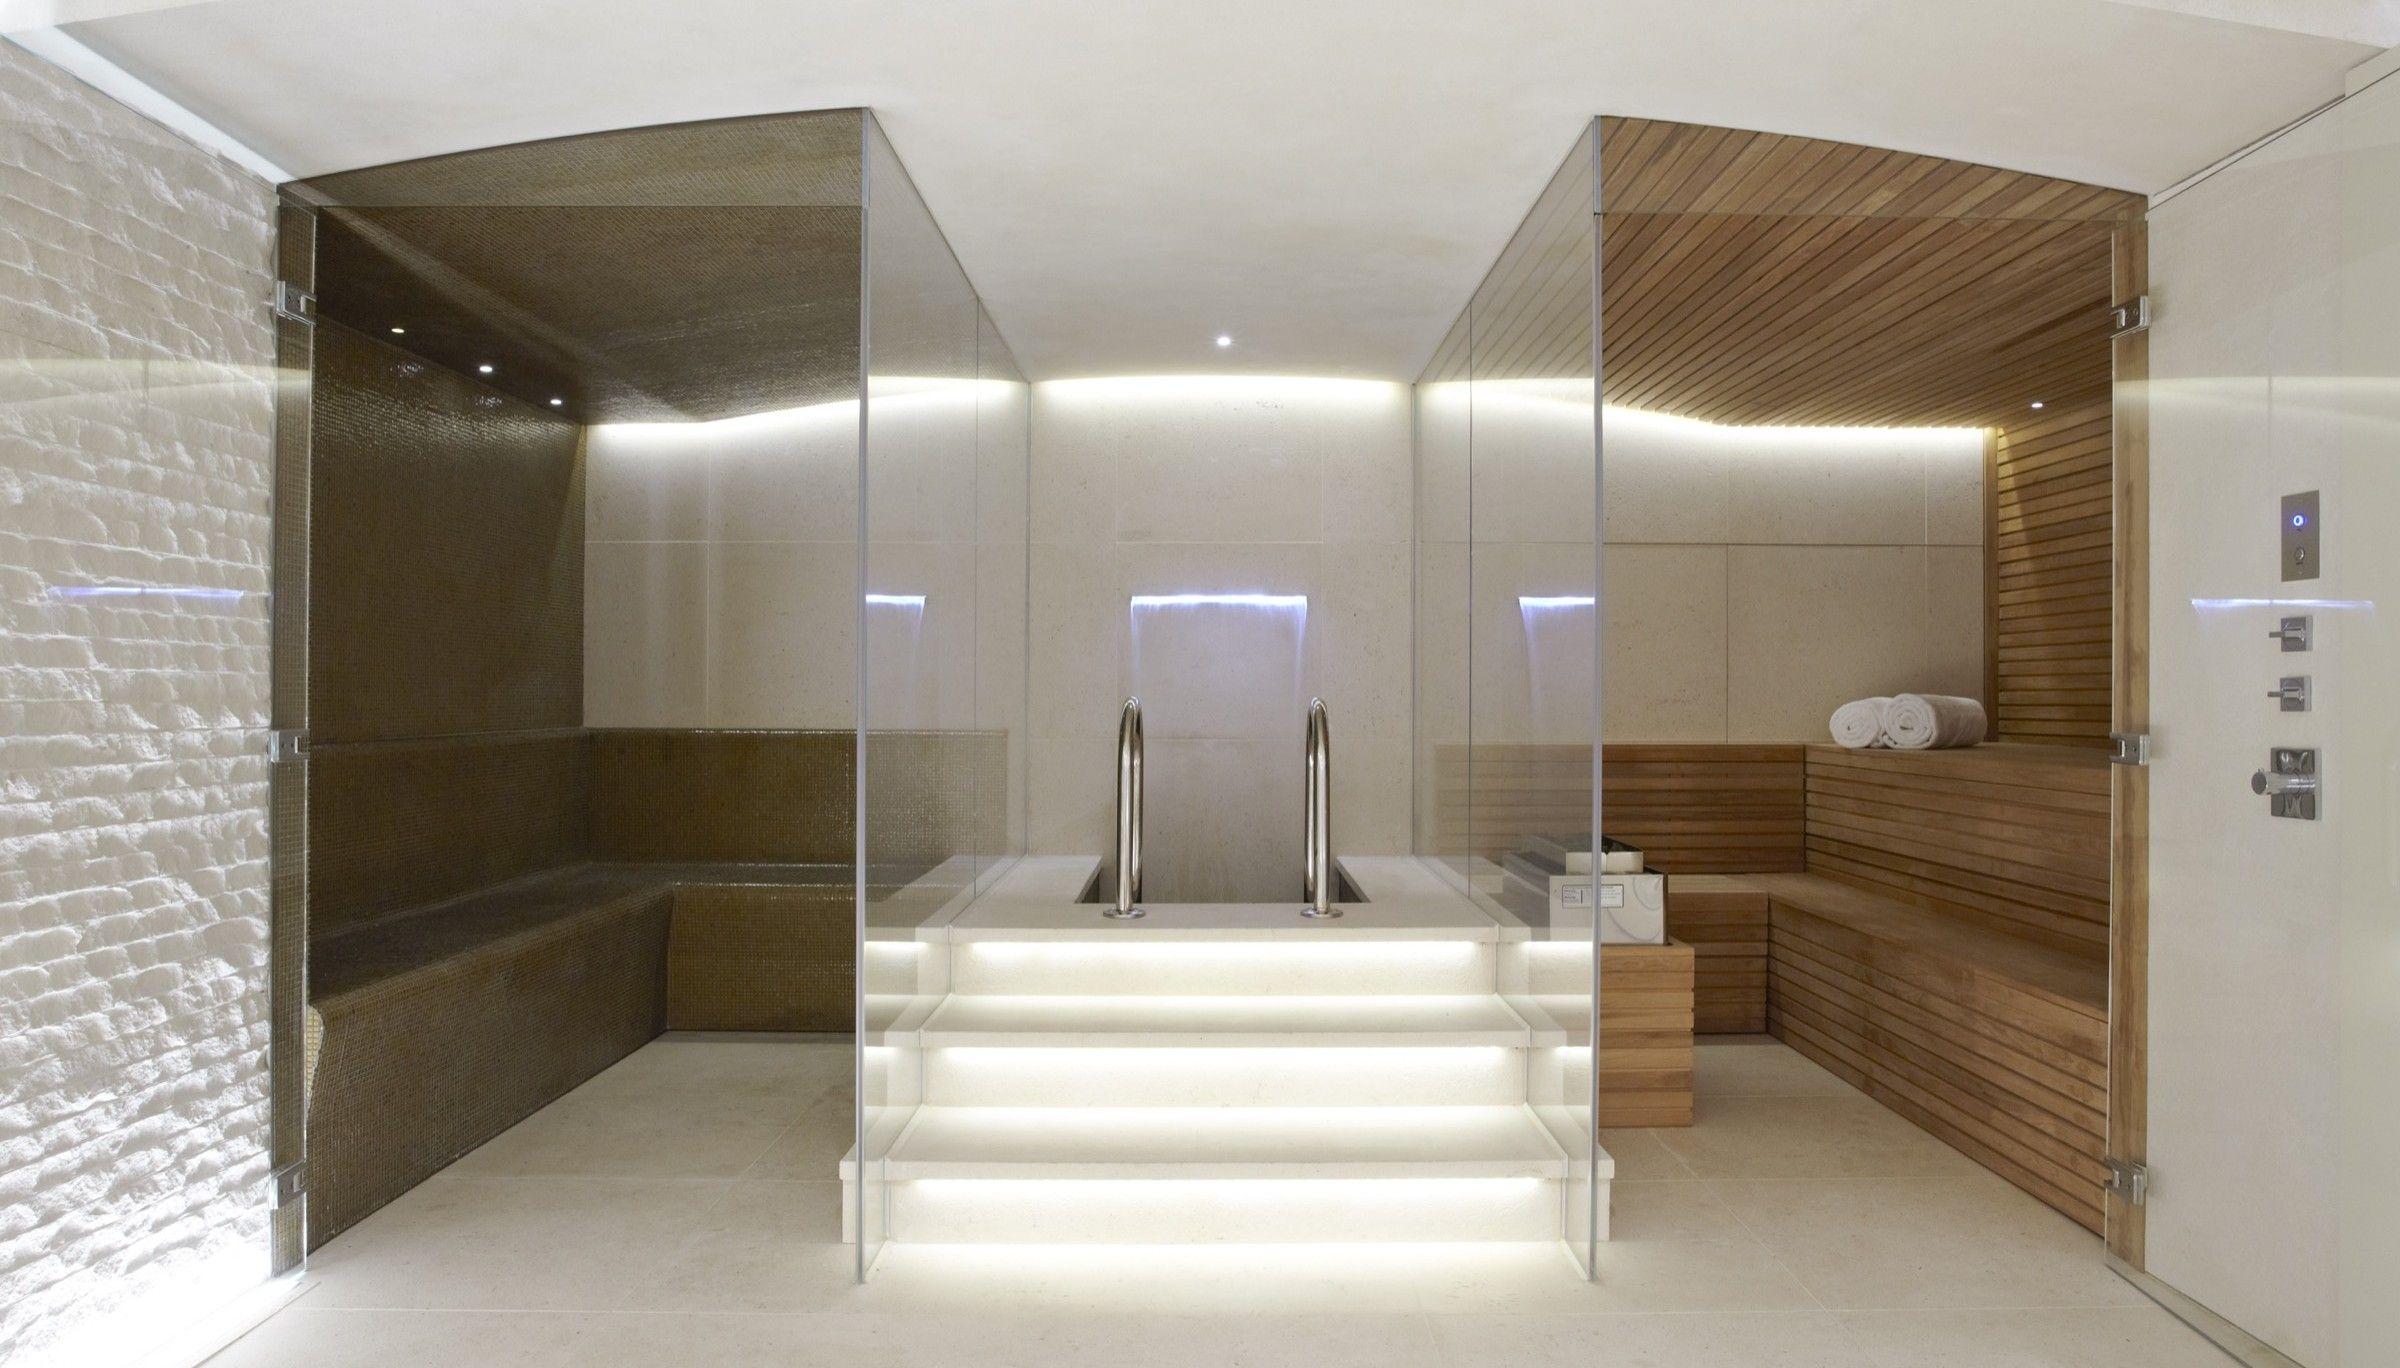 Knightbridge _ private basement spa/sauna _ lawson robb associates.